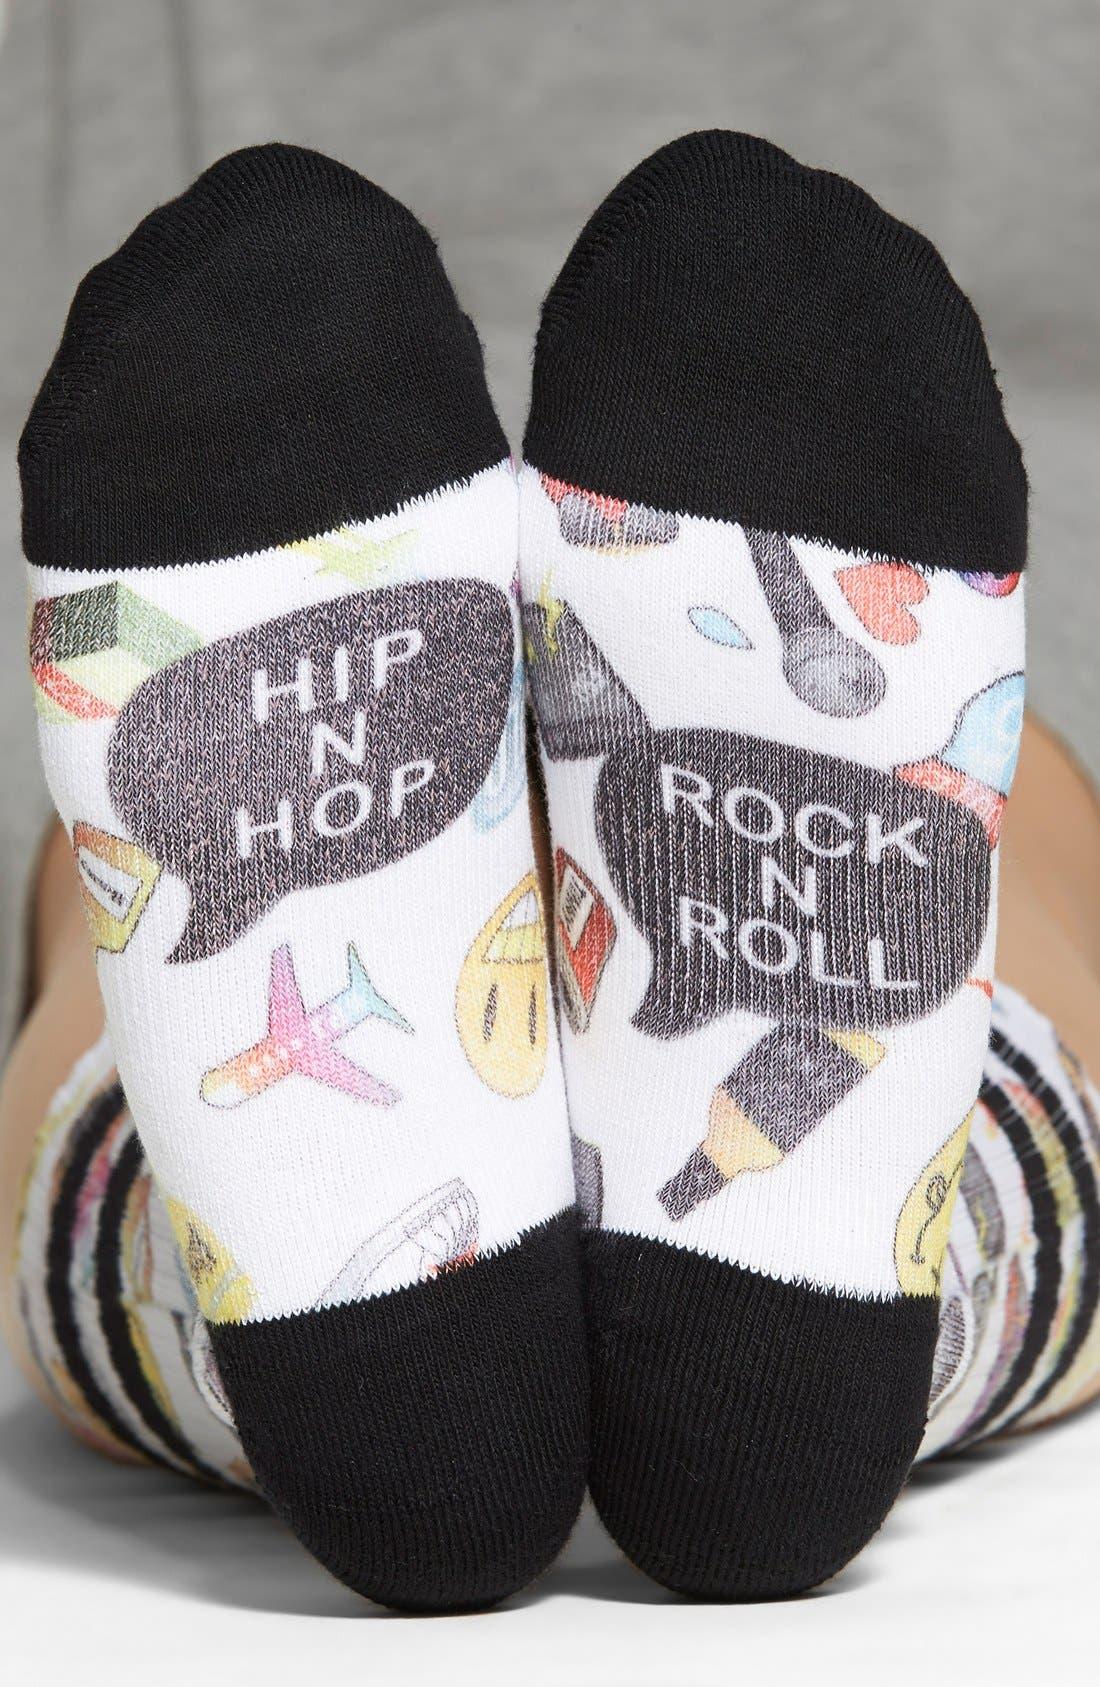 Alternate Image 1 Selected - Stance 'Hip 'N Hop' Crew Socks